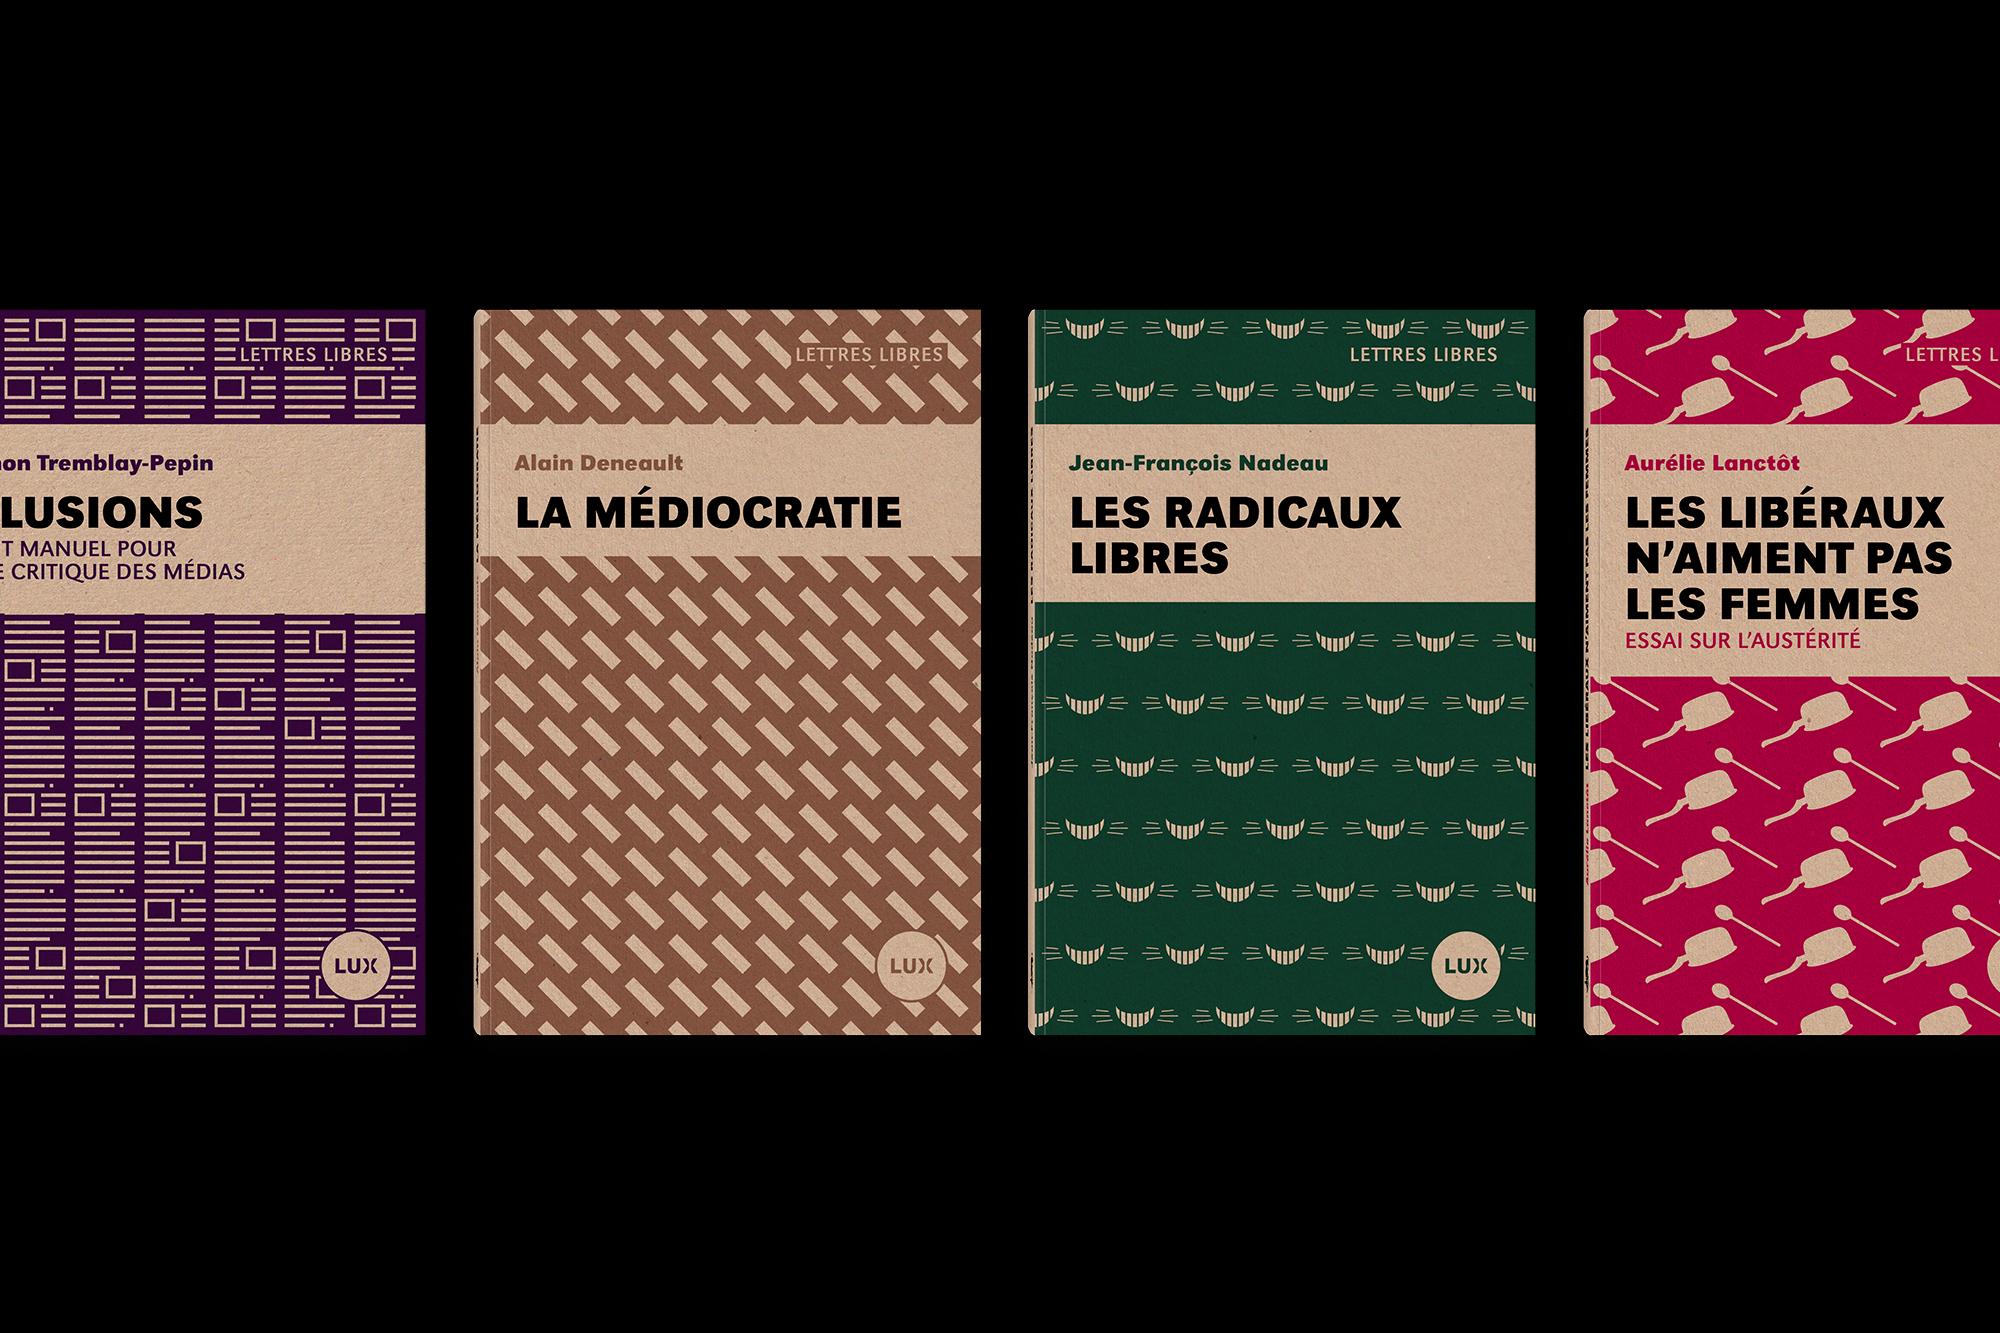 Lettres-libres-mockup-couvertures-4-5-6-7